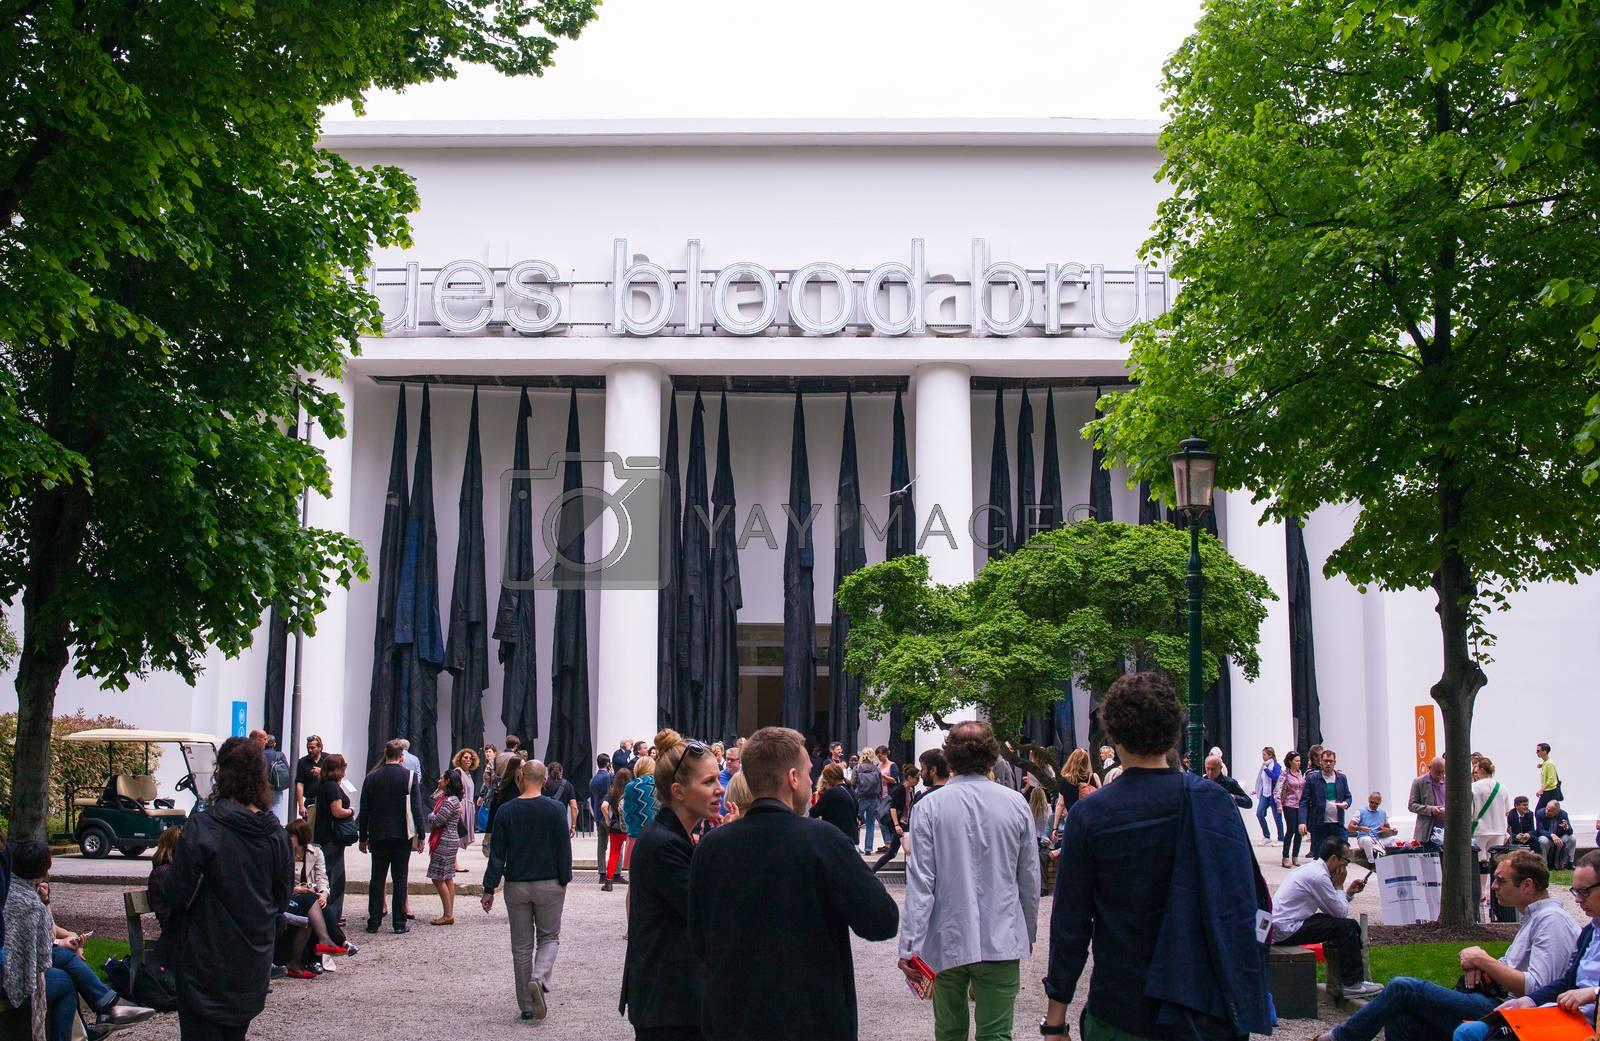 56th Venice biennale by bepsimage